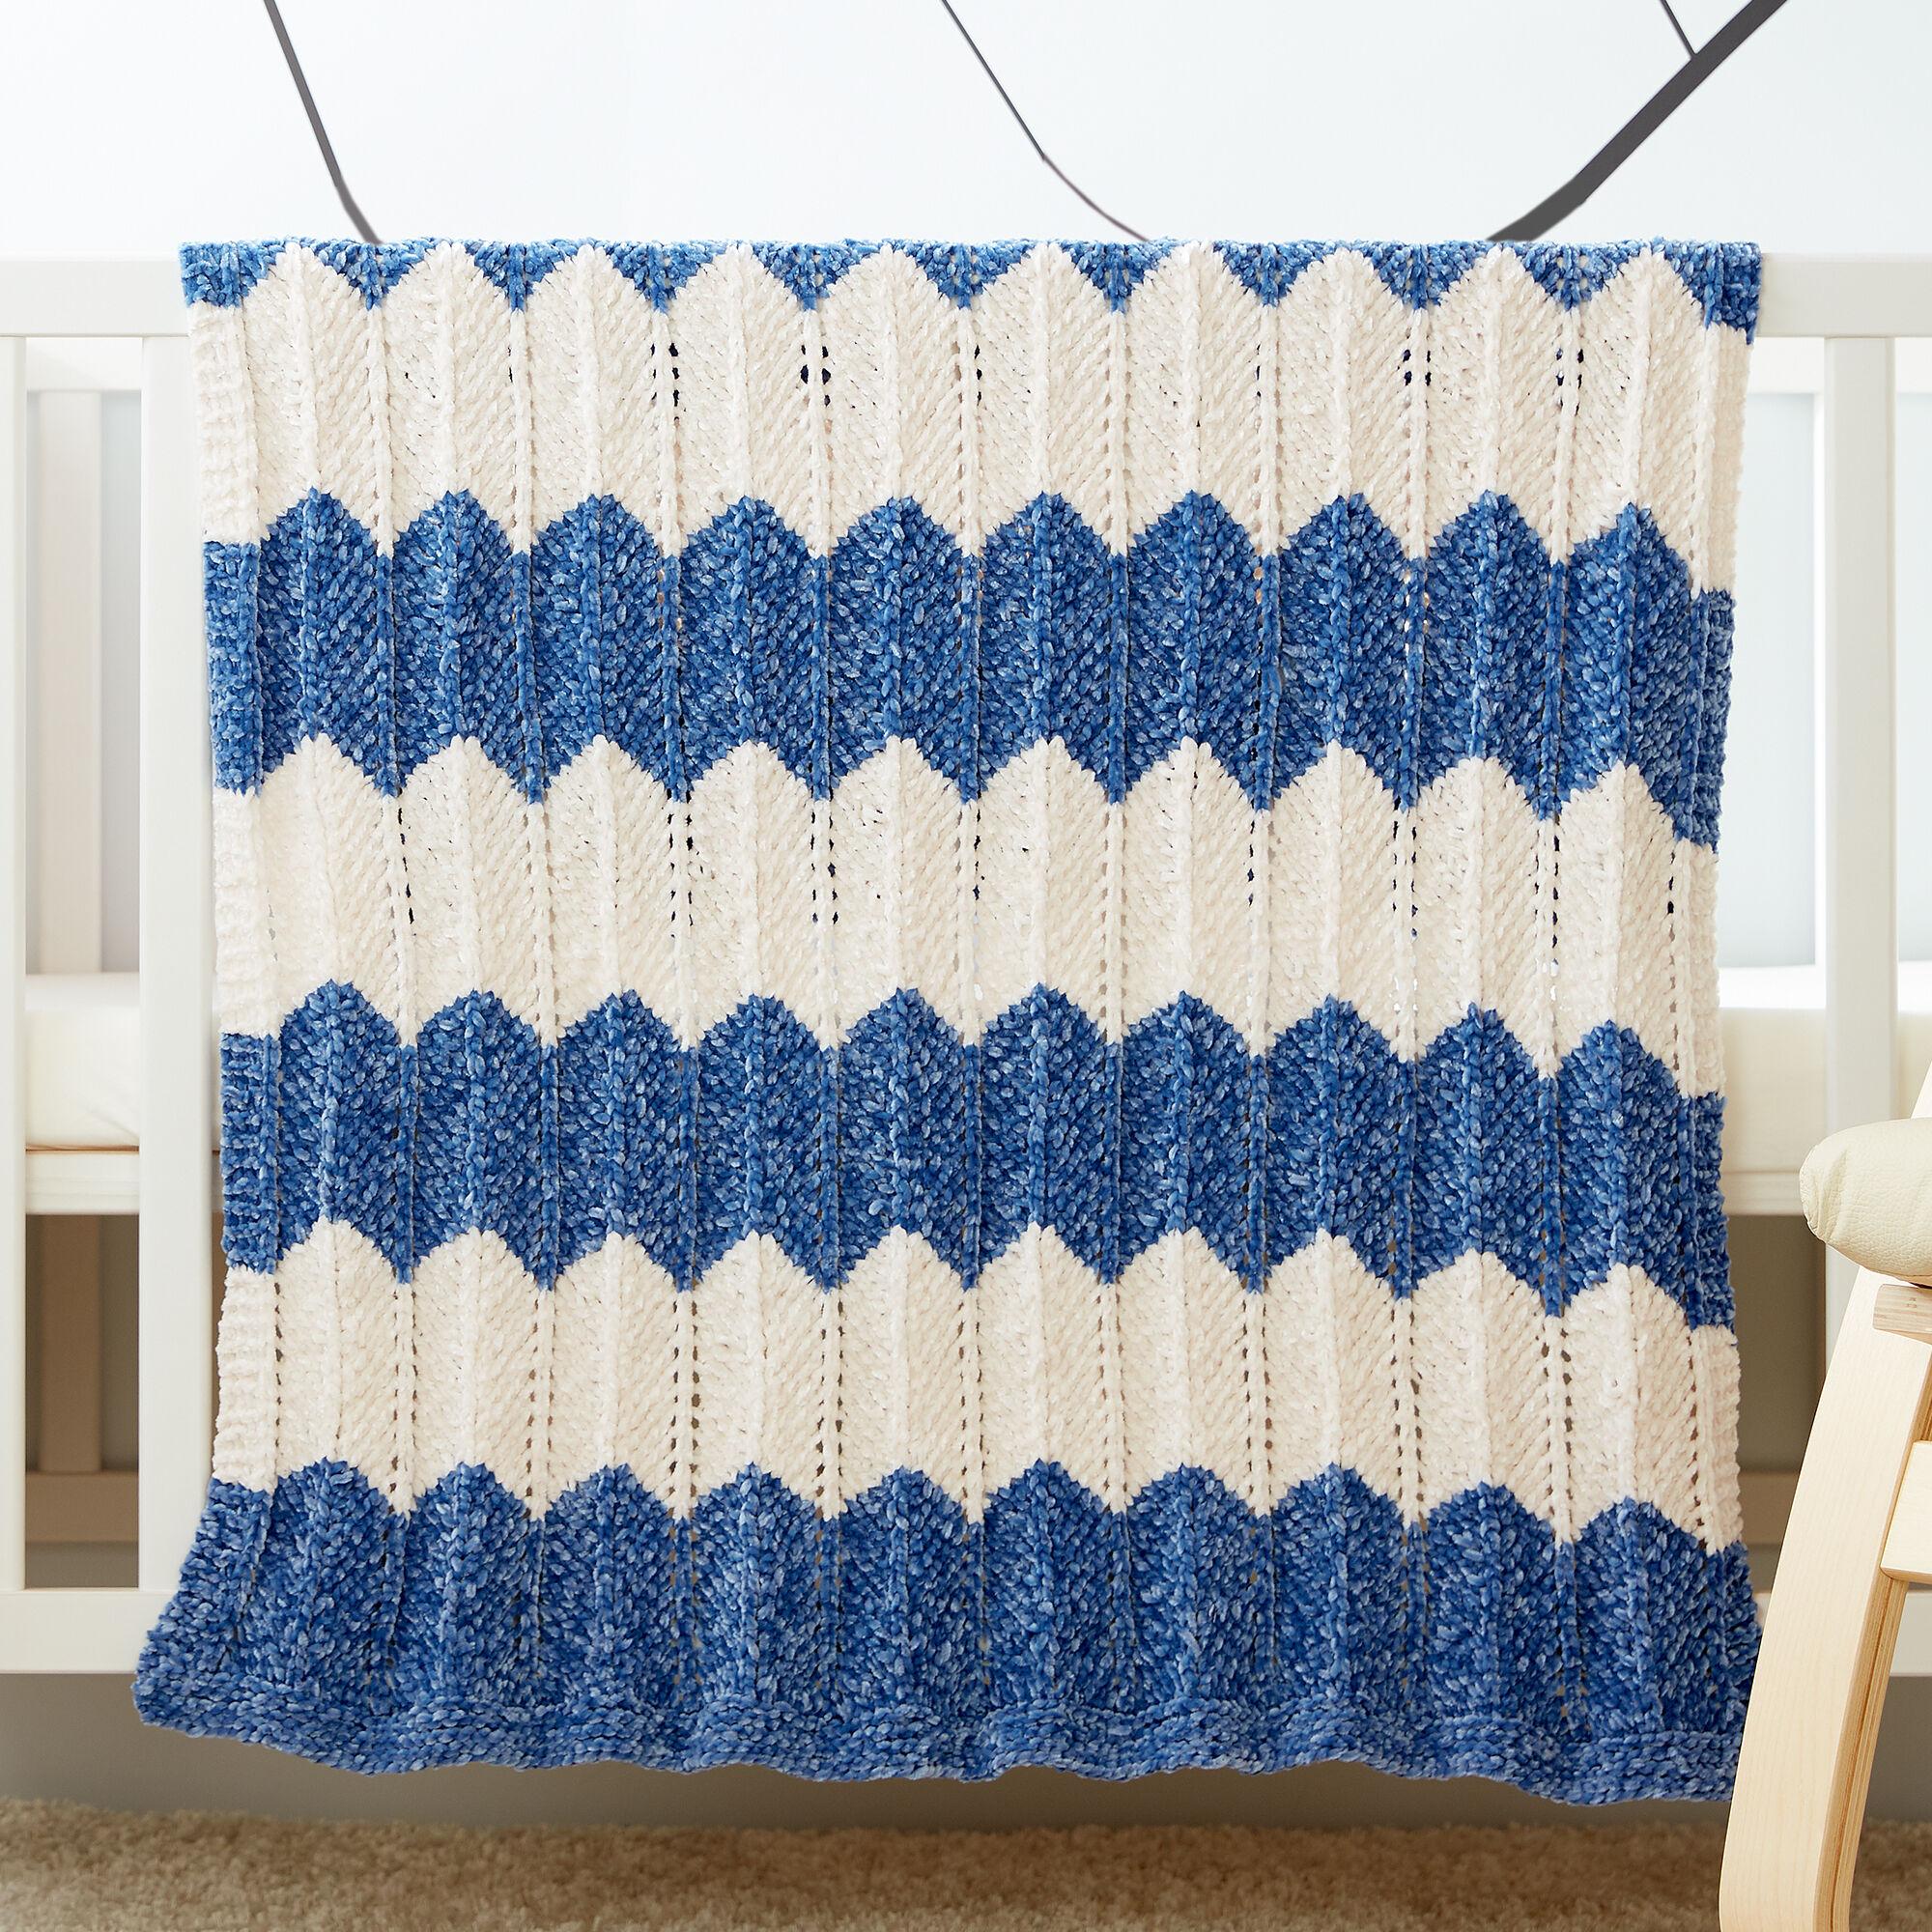 Bernat Knit Waves Blanket Pattern | Yarnspirations